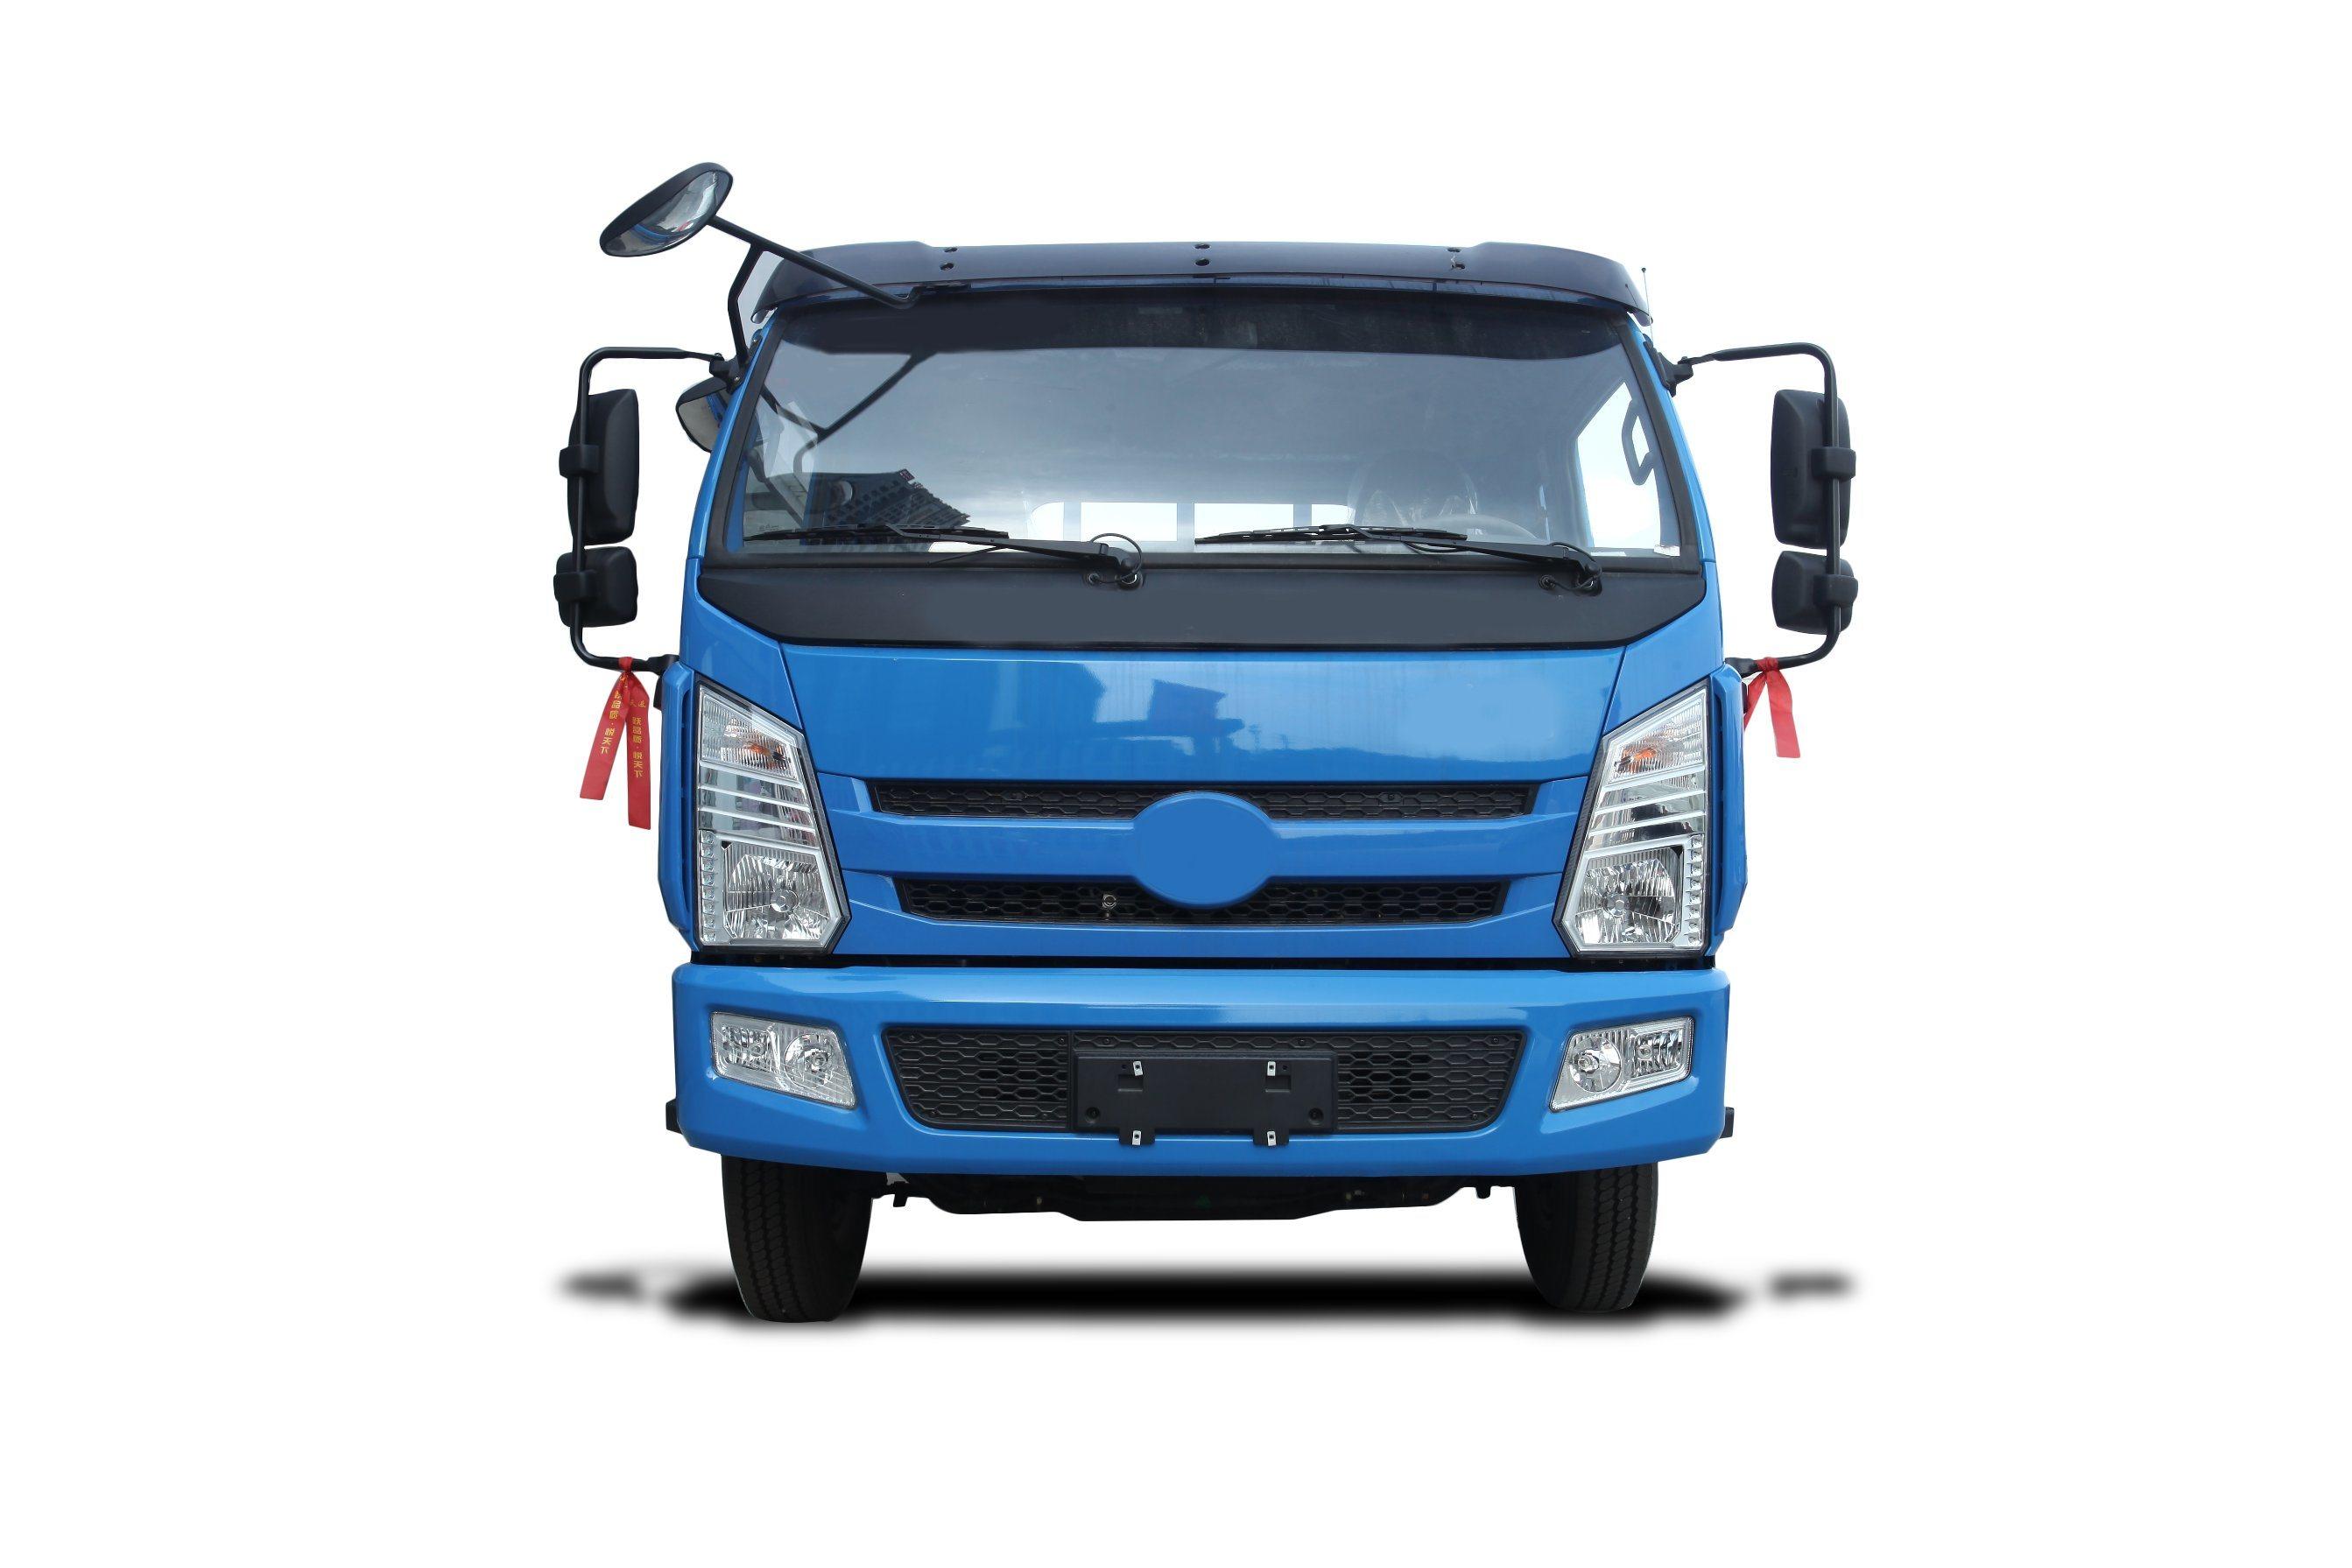 Mudan 5 Ton Space Cabin Cargo Truck